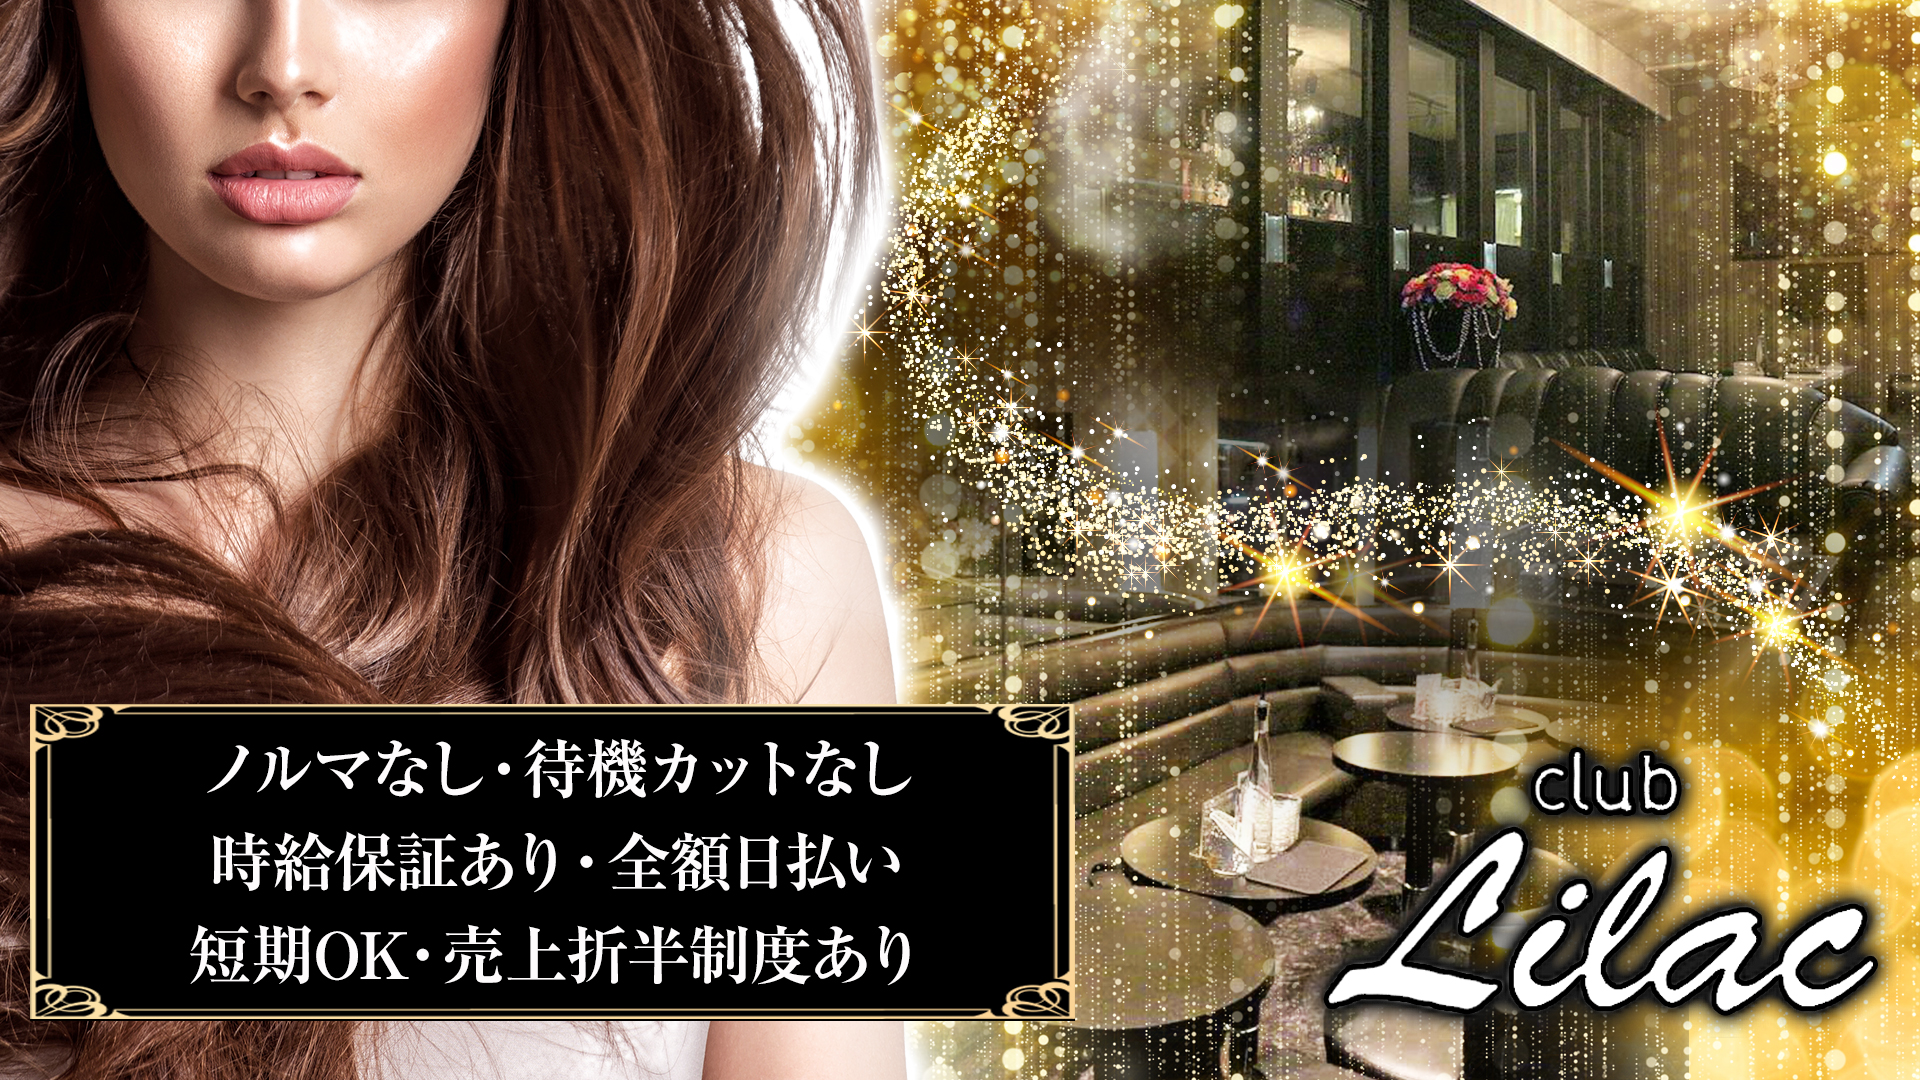 CLUB LiLY[リリィ] 立川 キャバクラ TOP画像